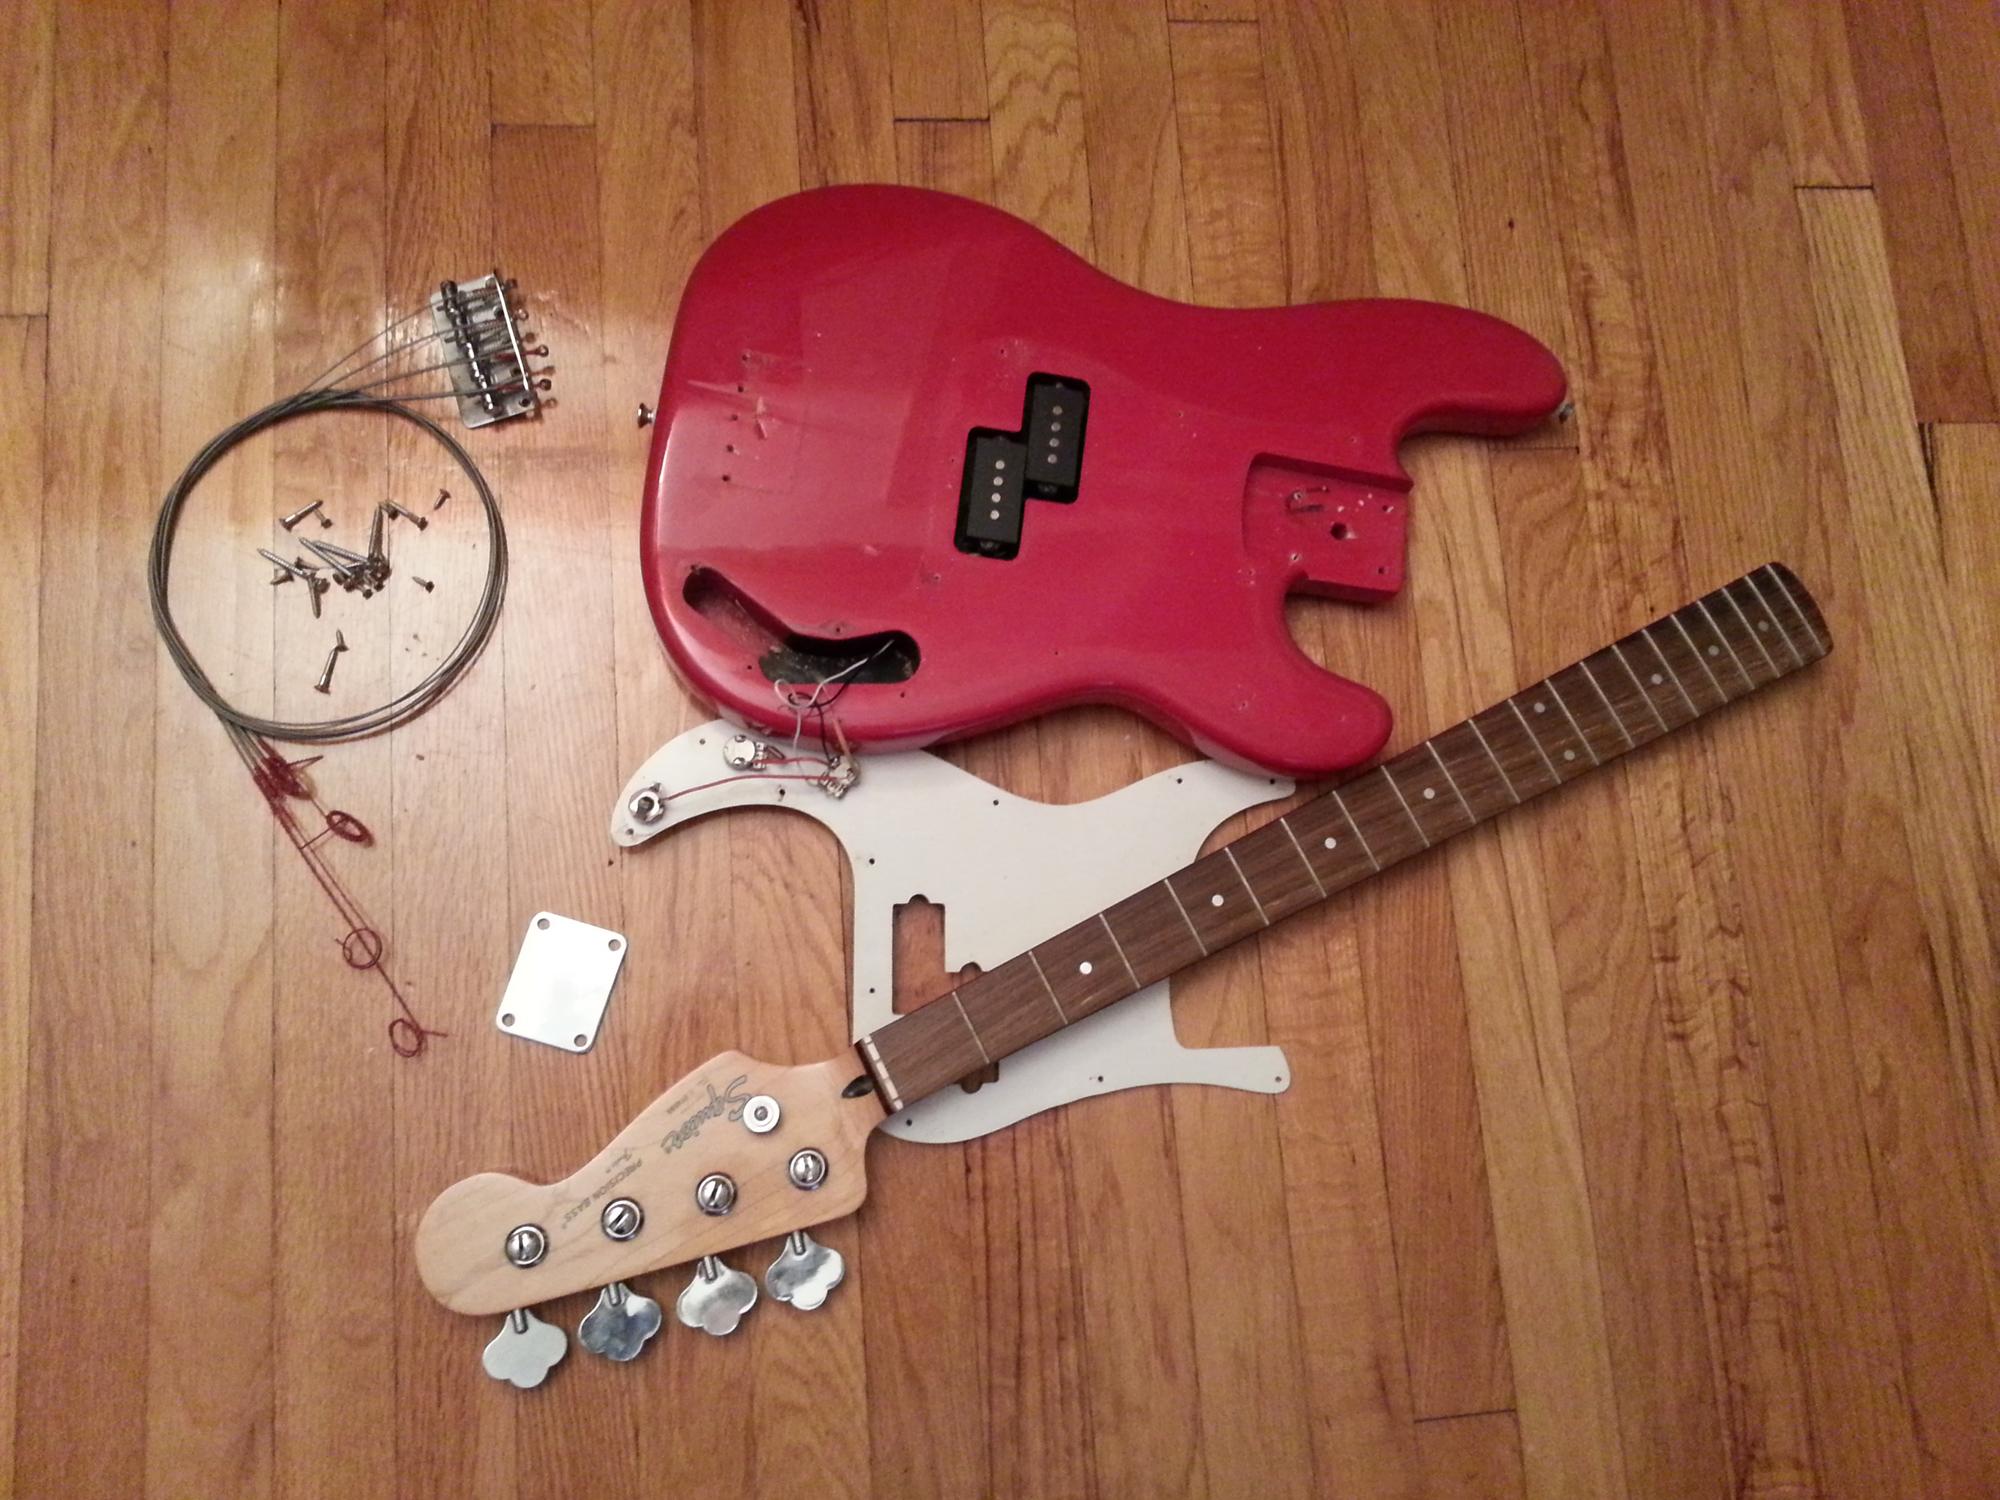 Fender squire precision bas